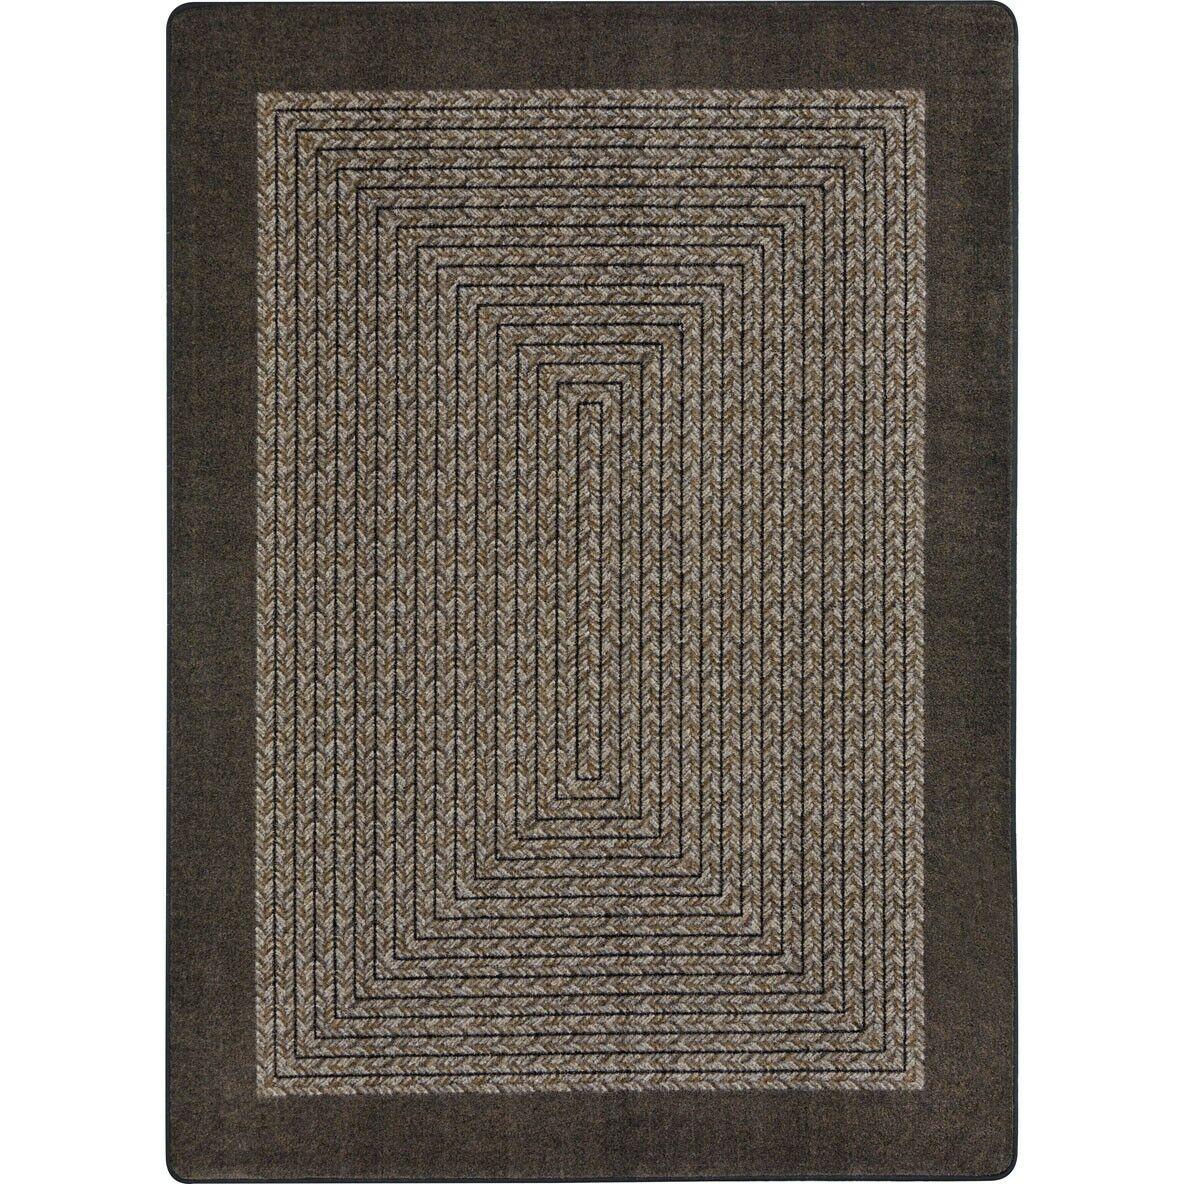 Constantine Chocolate Area Rug Rug Size: 7'8